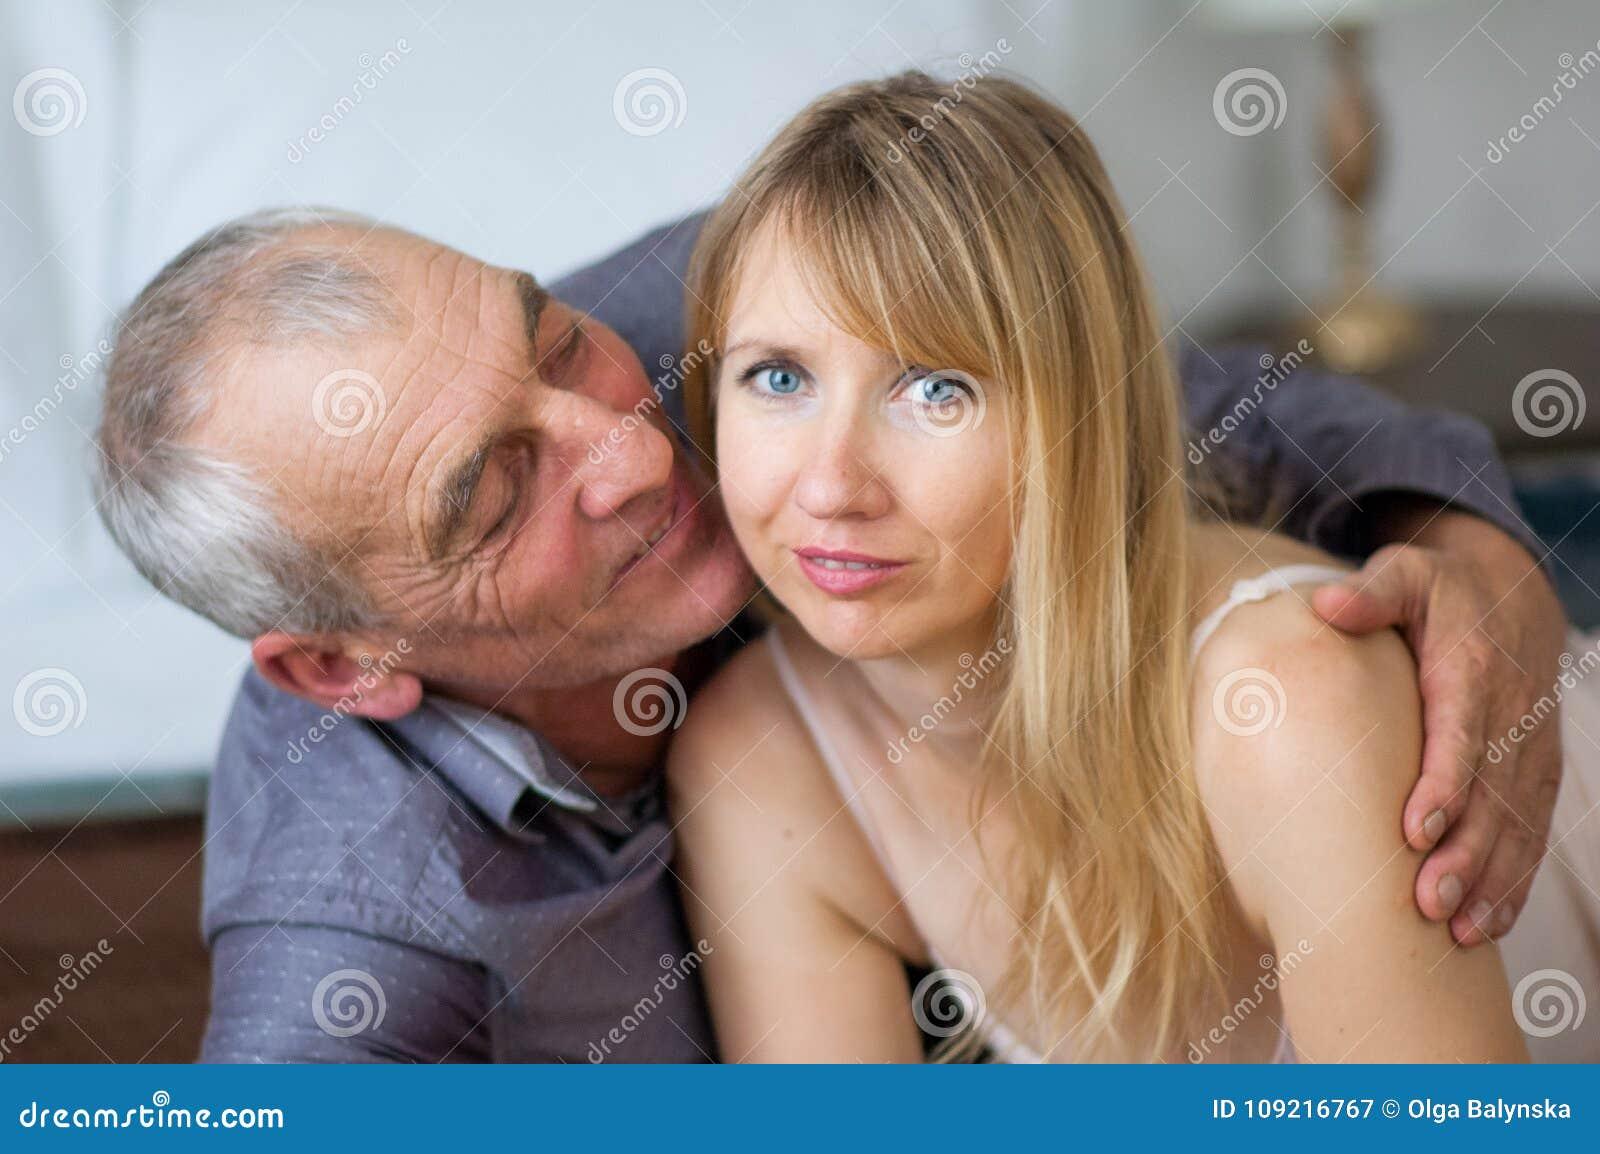 Mann frau alter junge Altersunterschied